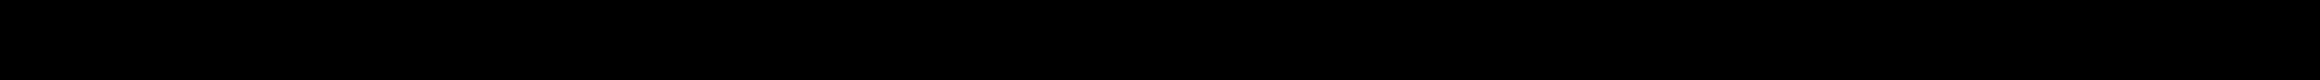 MAGNETI MARELLI 119110402100, 60521992, 16121115862, 16141178751, 16141179232 Brandstofpomp